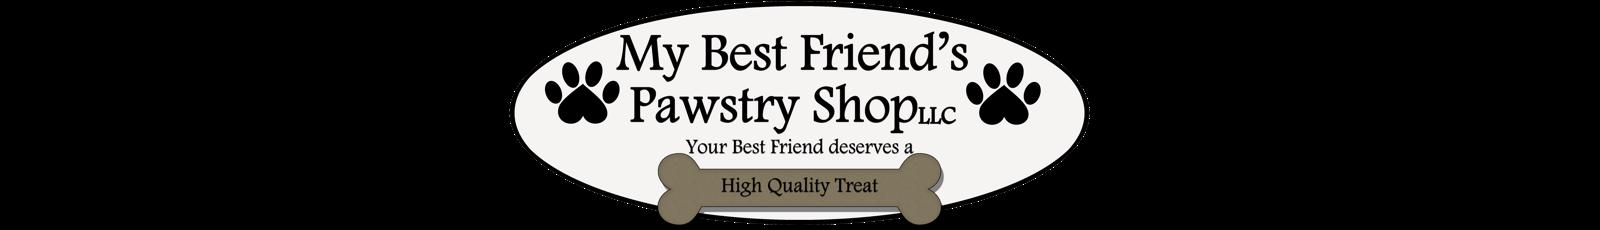 My Best Friend's Pawstry Shop Logo